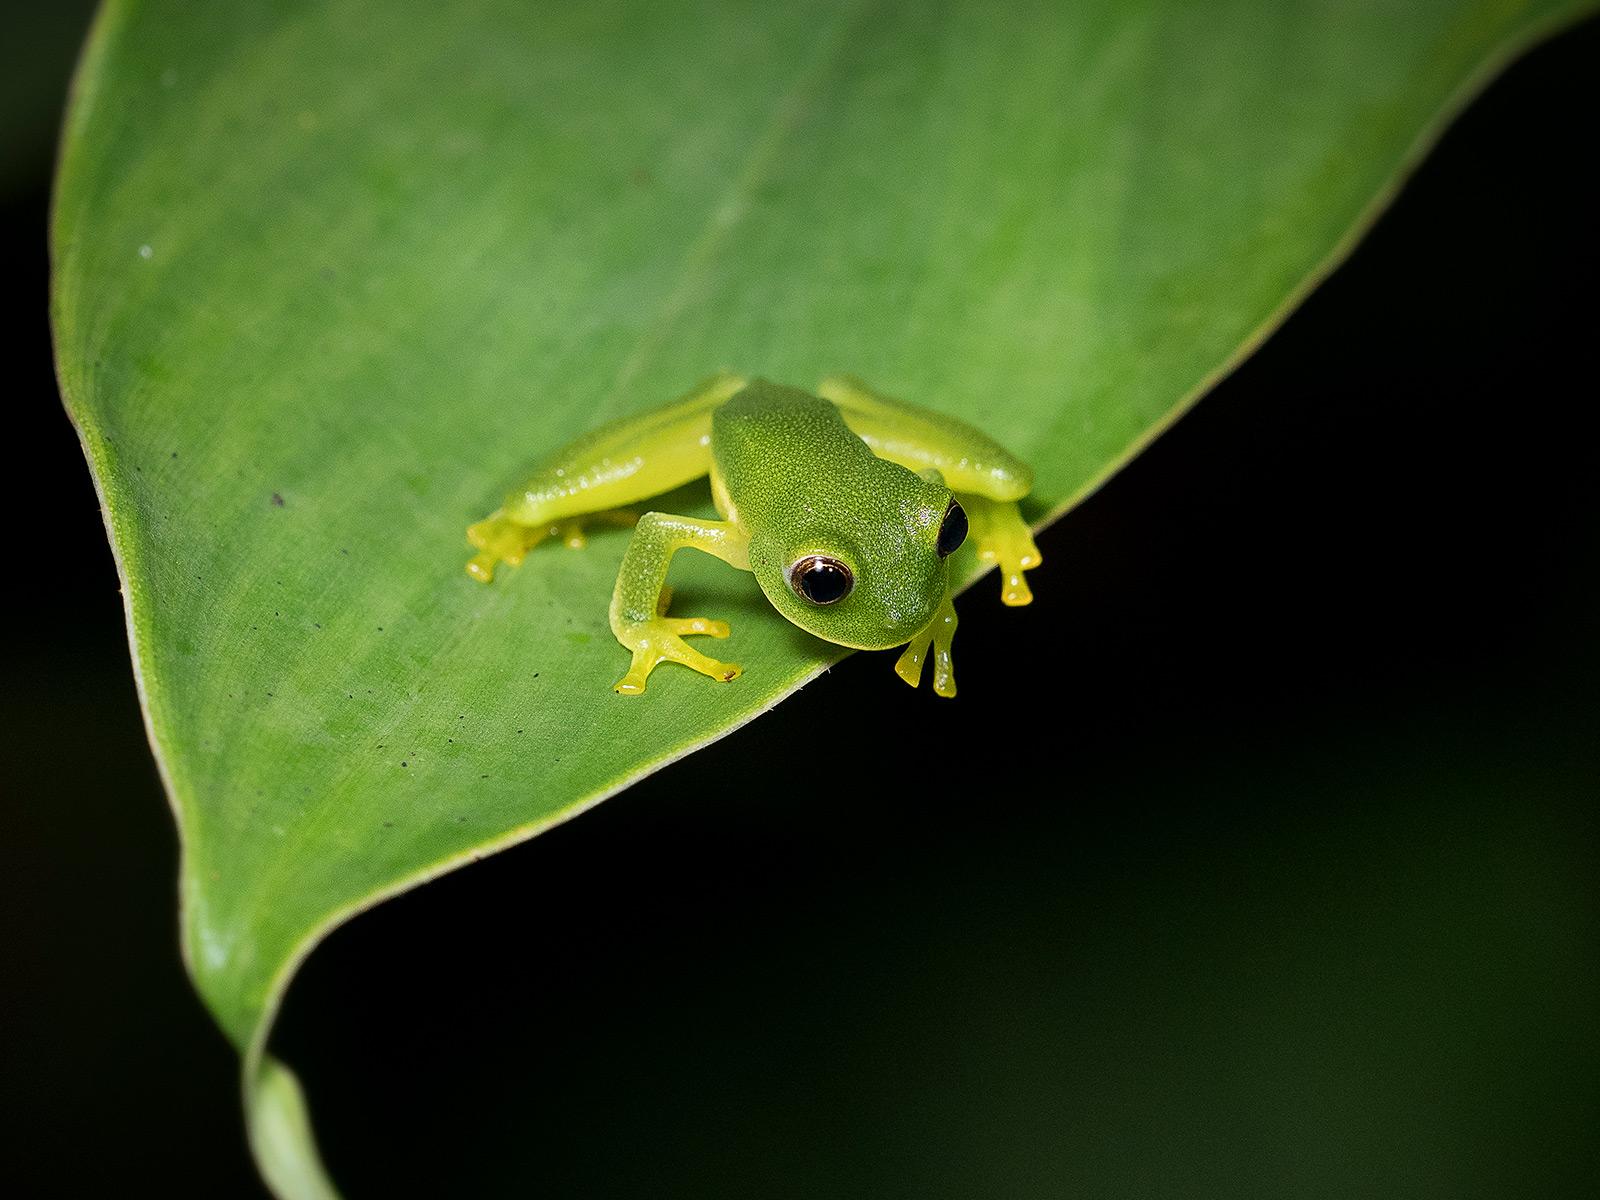 Magdalena Giant Glass-frog (Ikakogi tayrona), Sierra Nevada de Santa Marta, Colombia